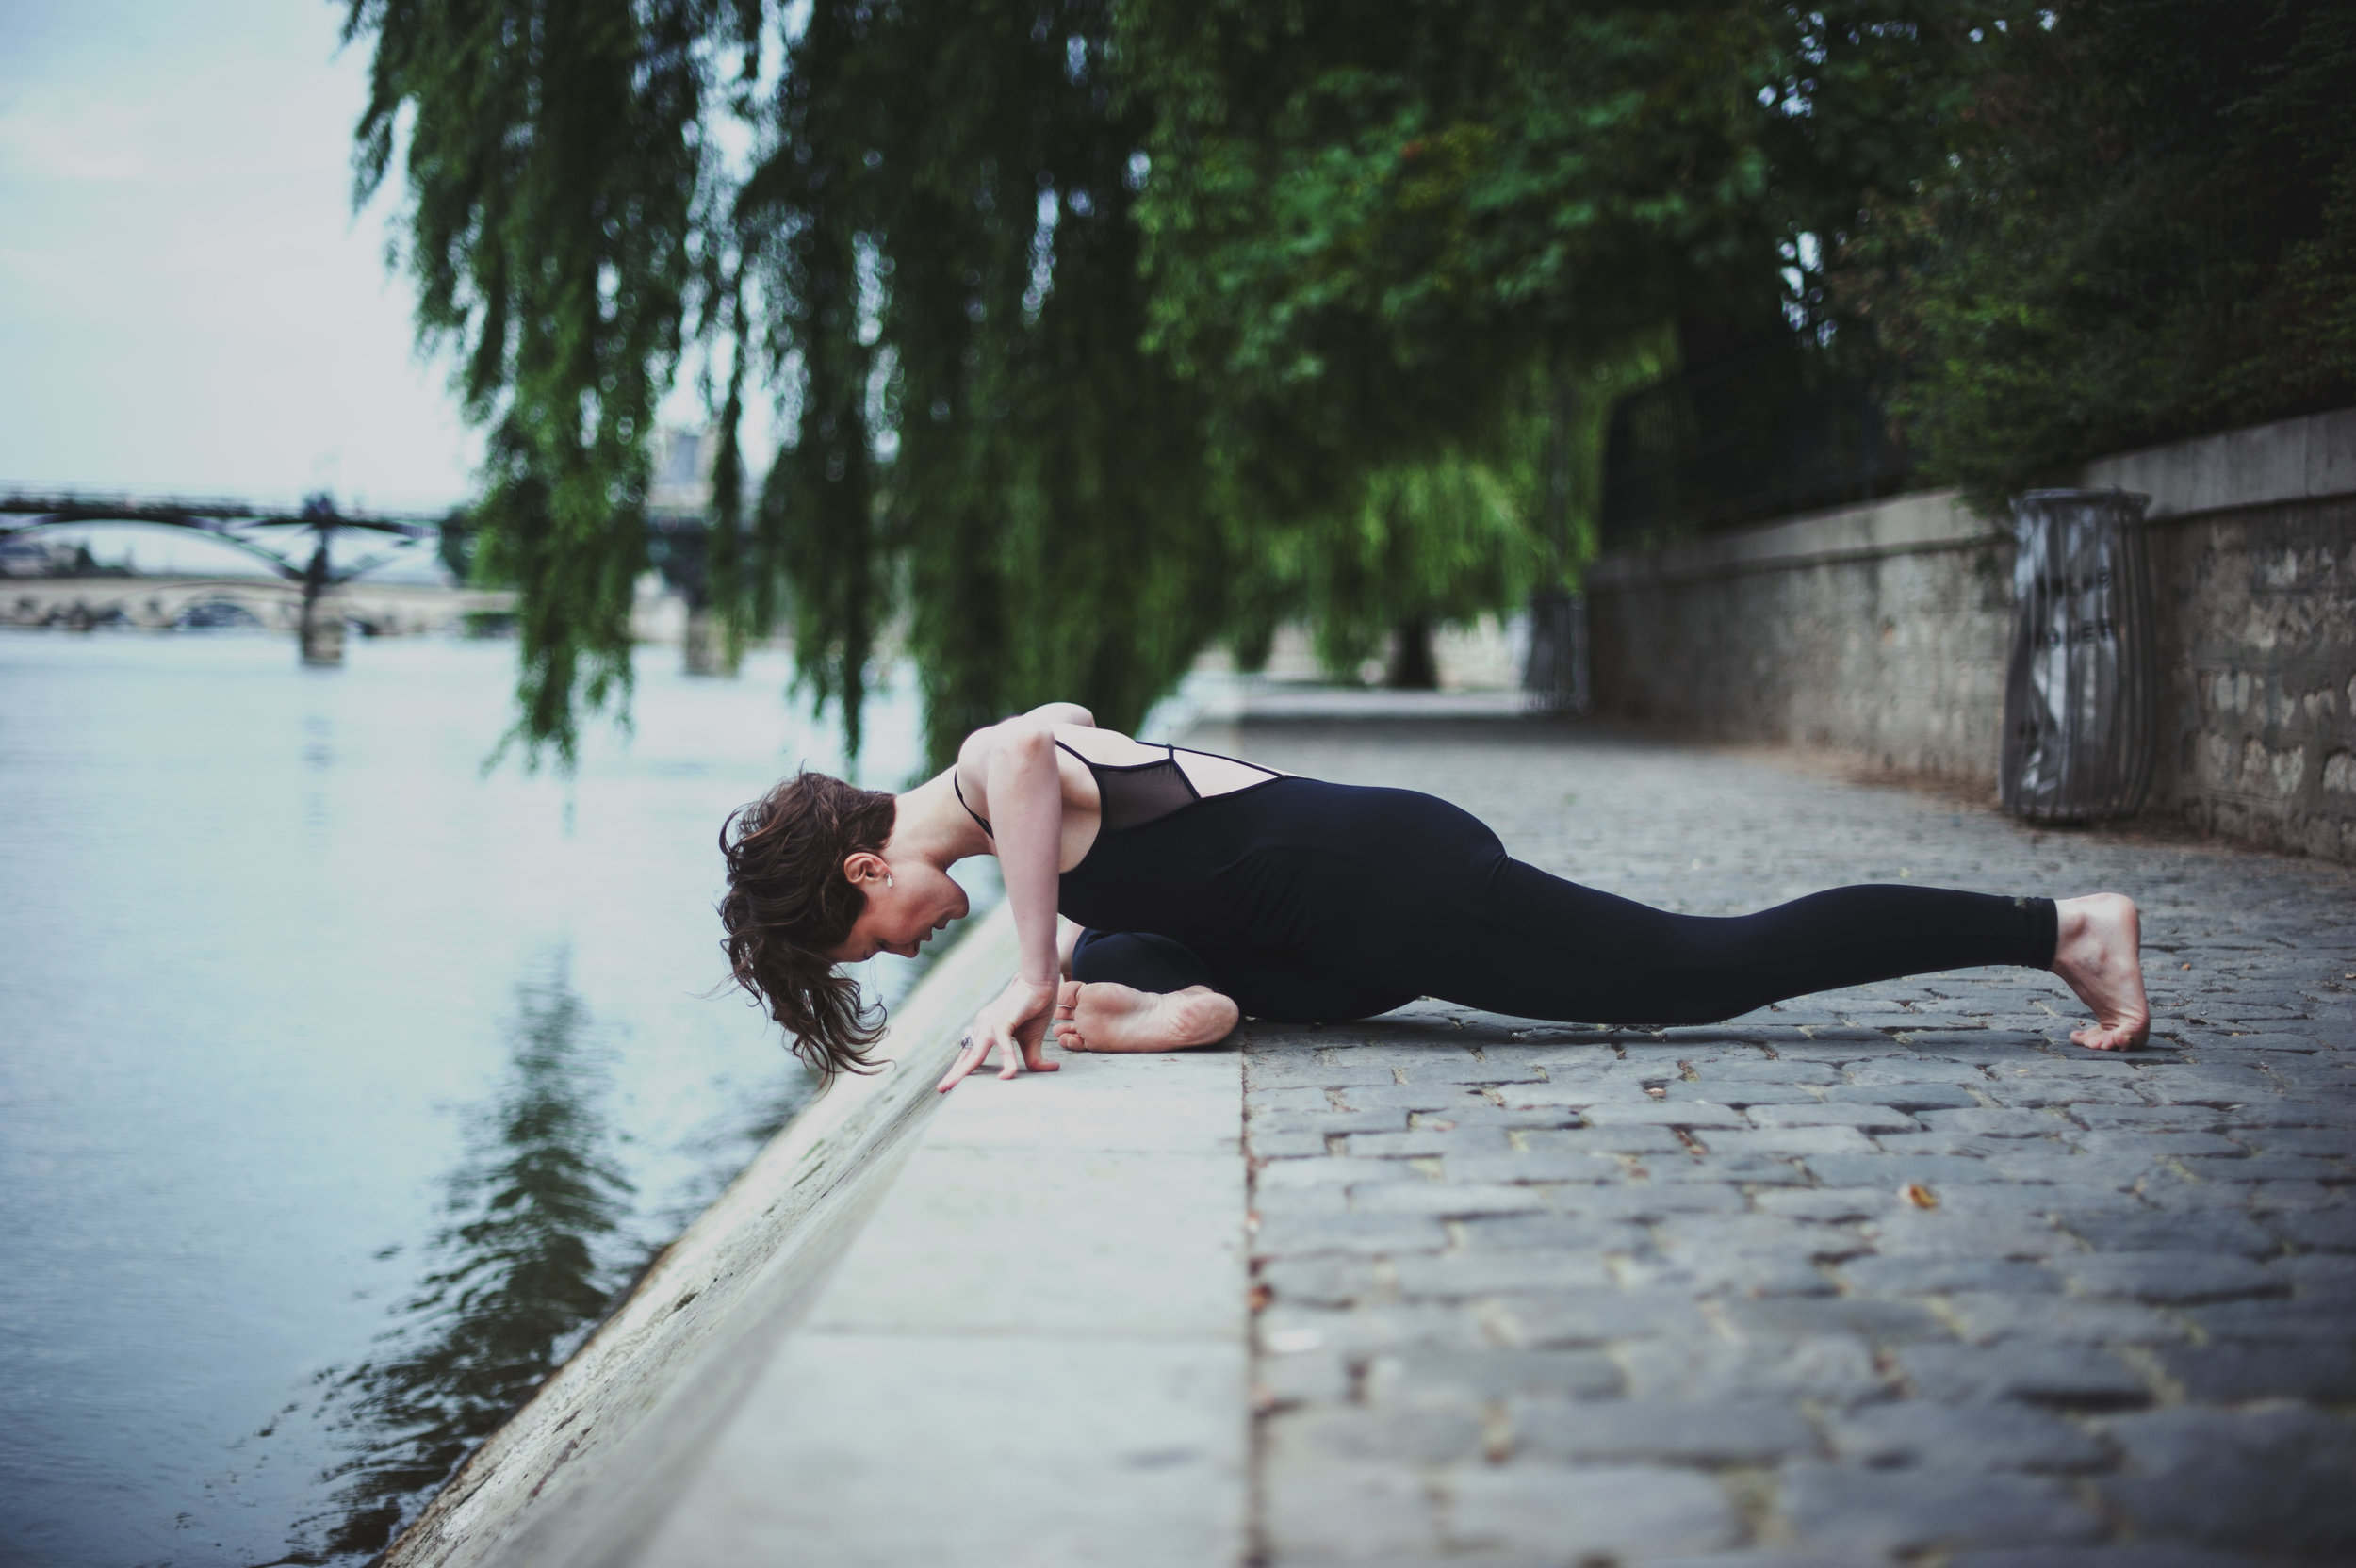 yoga-foto-paris-seine-5.jpg